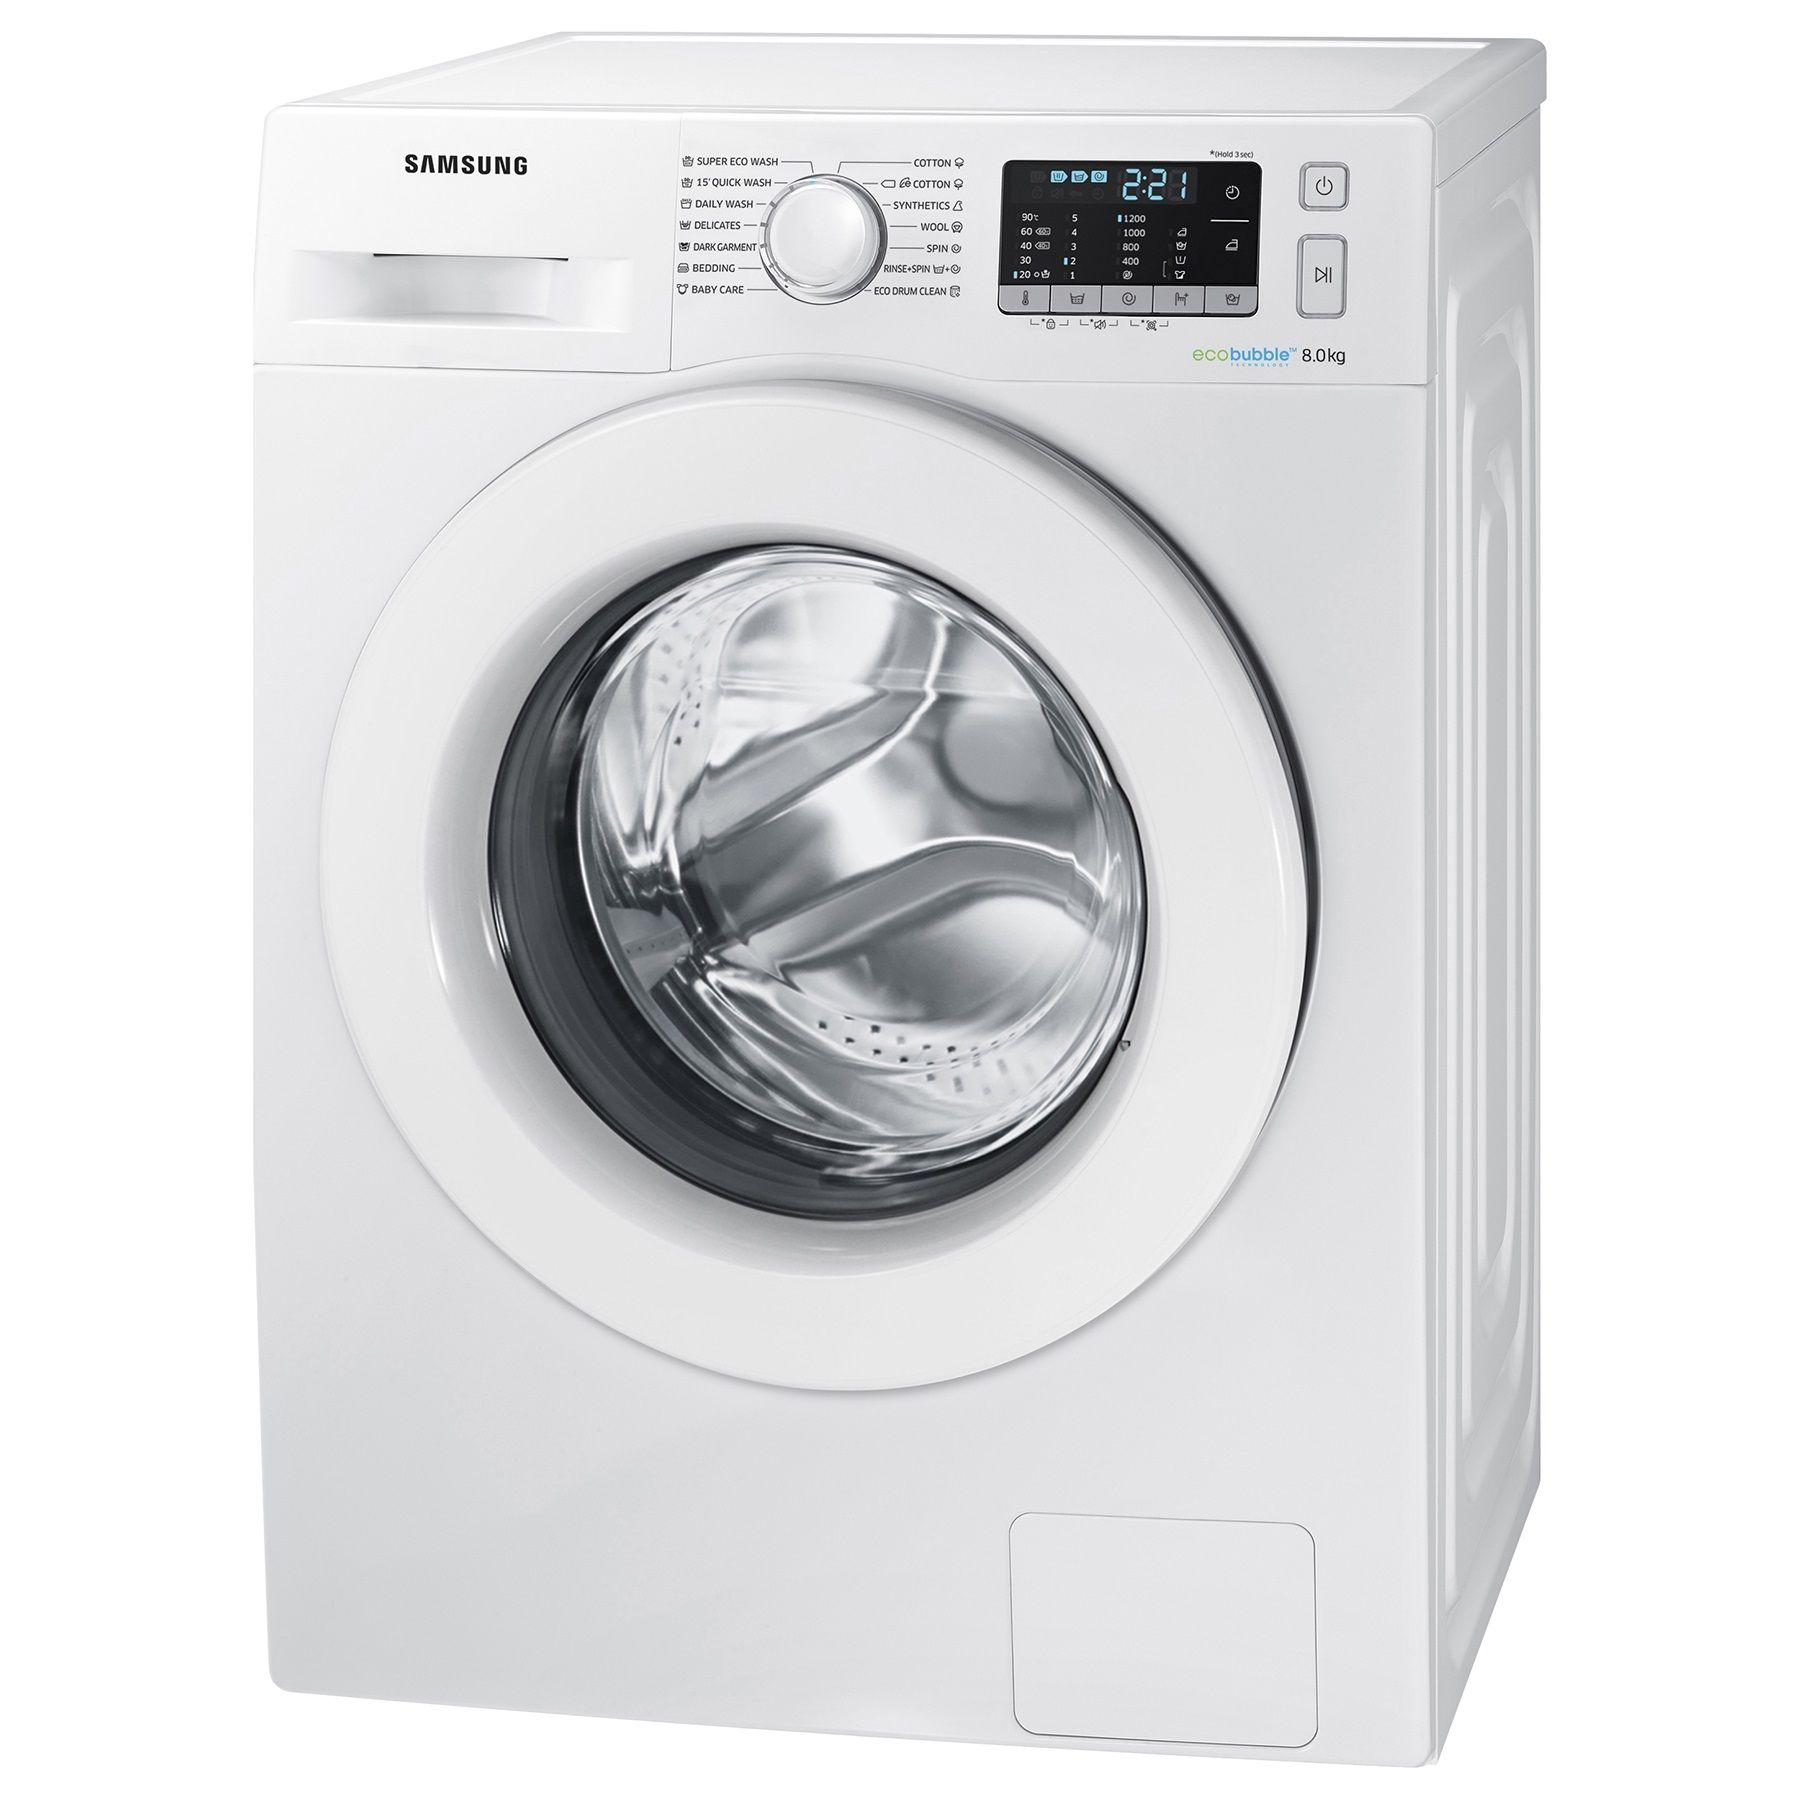 Пералня Samsung WW80J5345MW/LE, EcoBubble, 8 кг, 1200 об/мин, Клас A+++, 60 см, Бяла